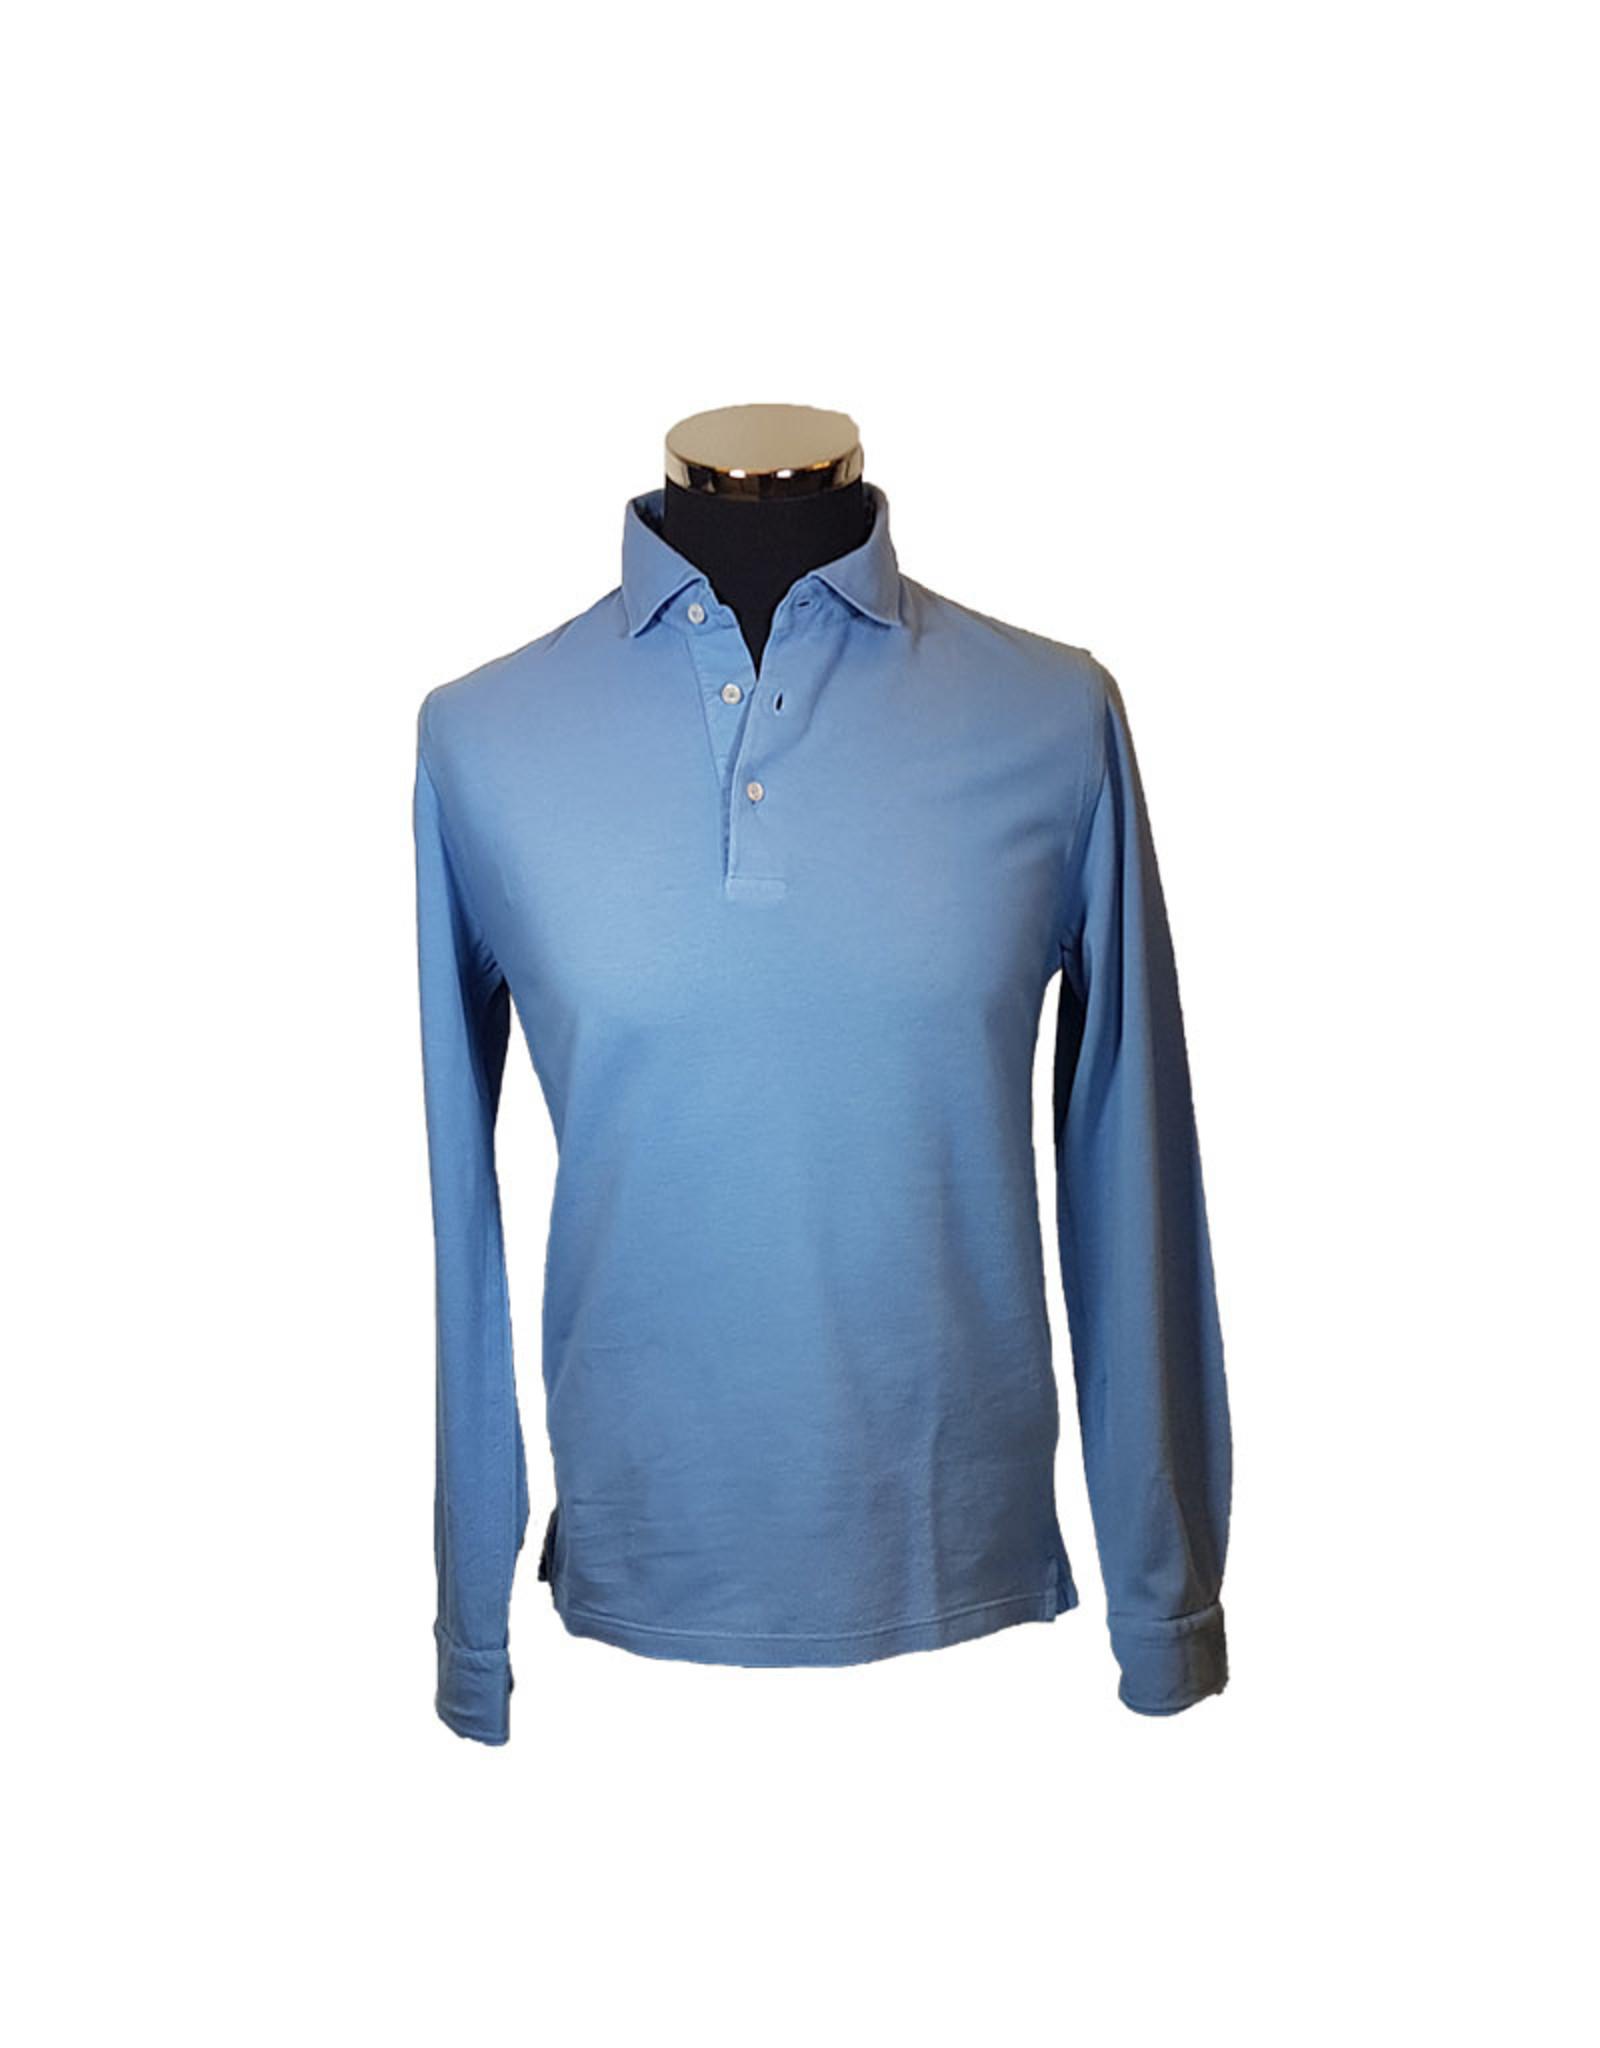 Gran Sasso Sandmore's polohemd blauw 79081/134 M:60111